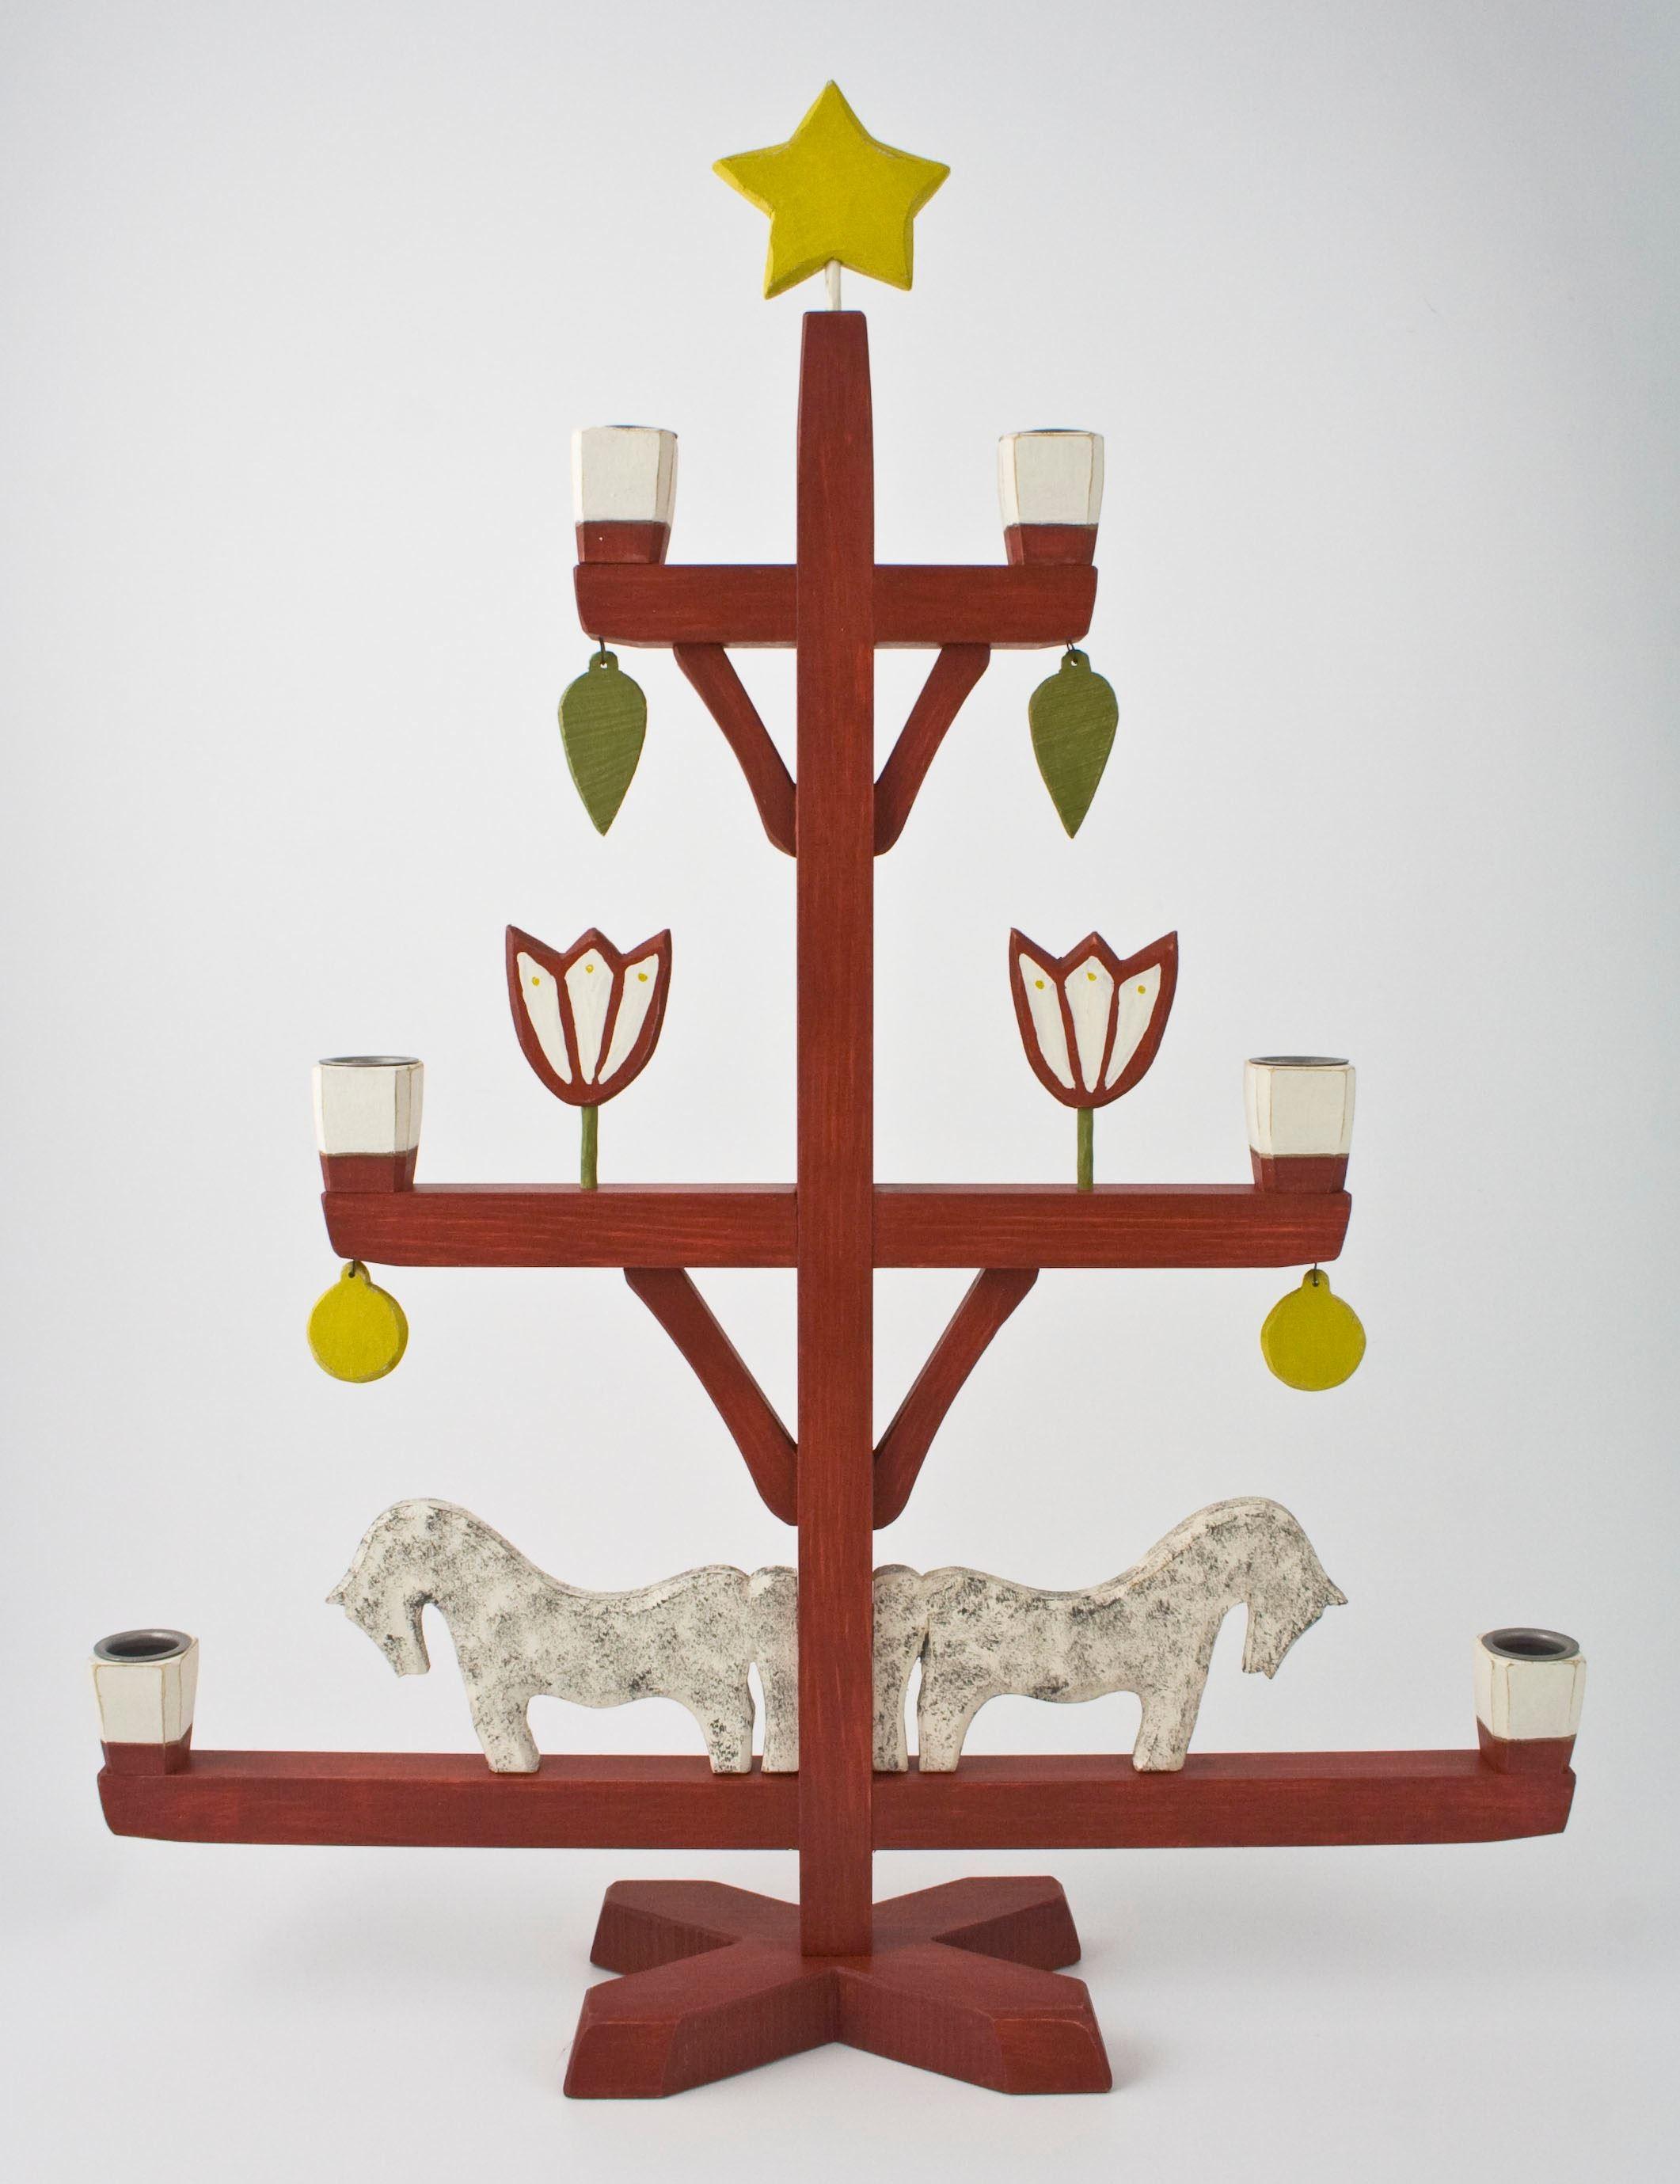 Konsthantverk Lindqvist - handicraft